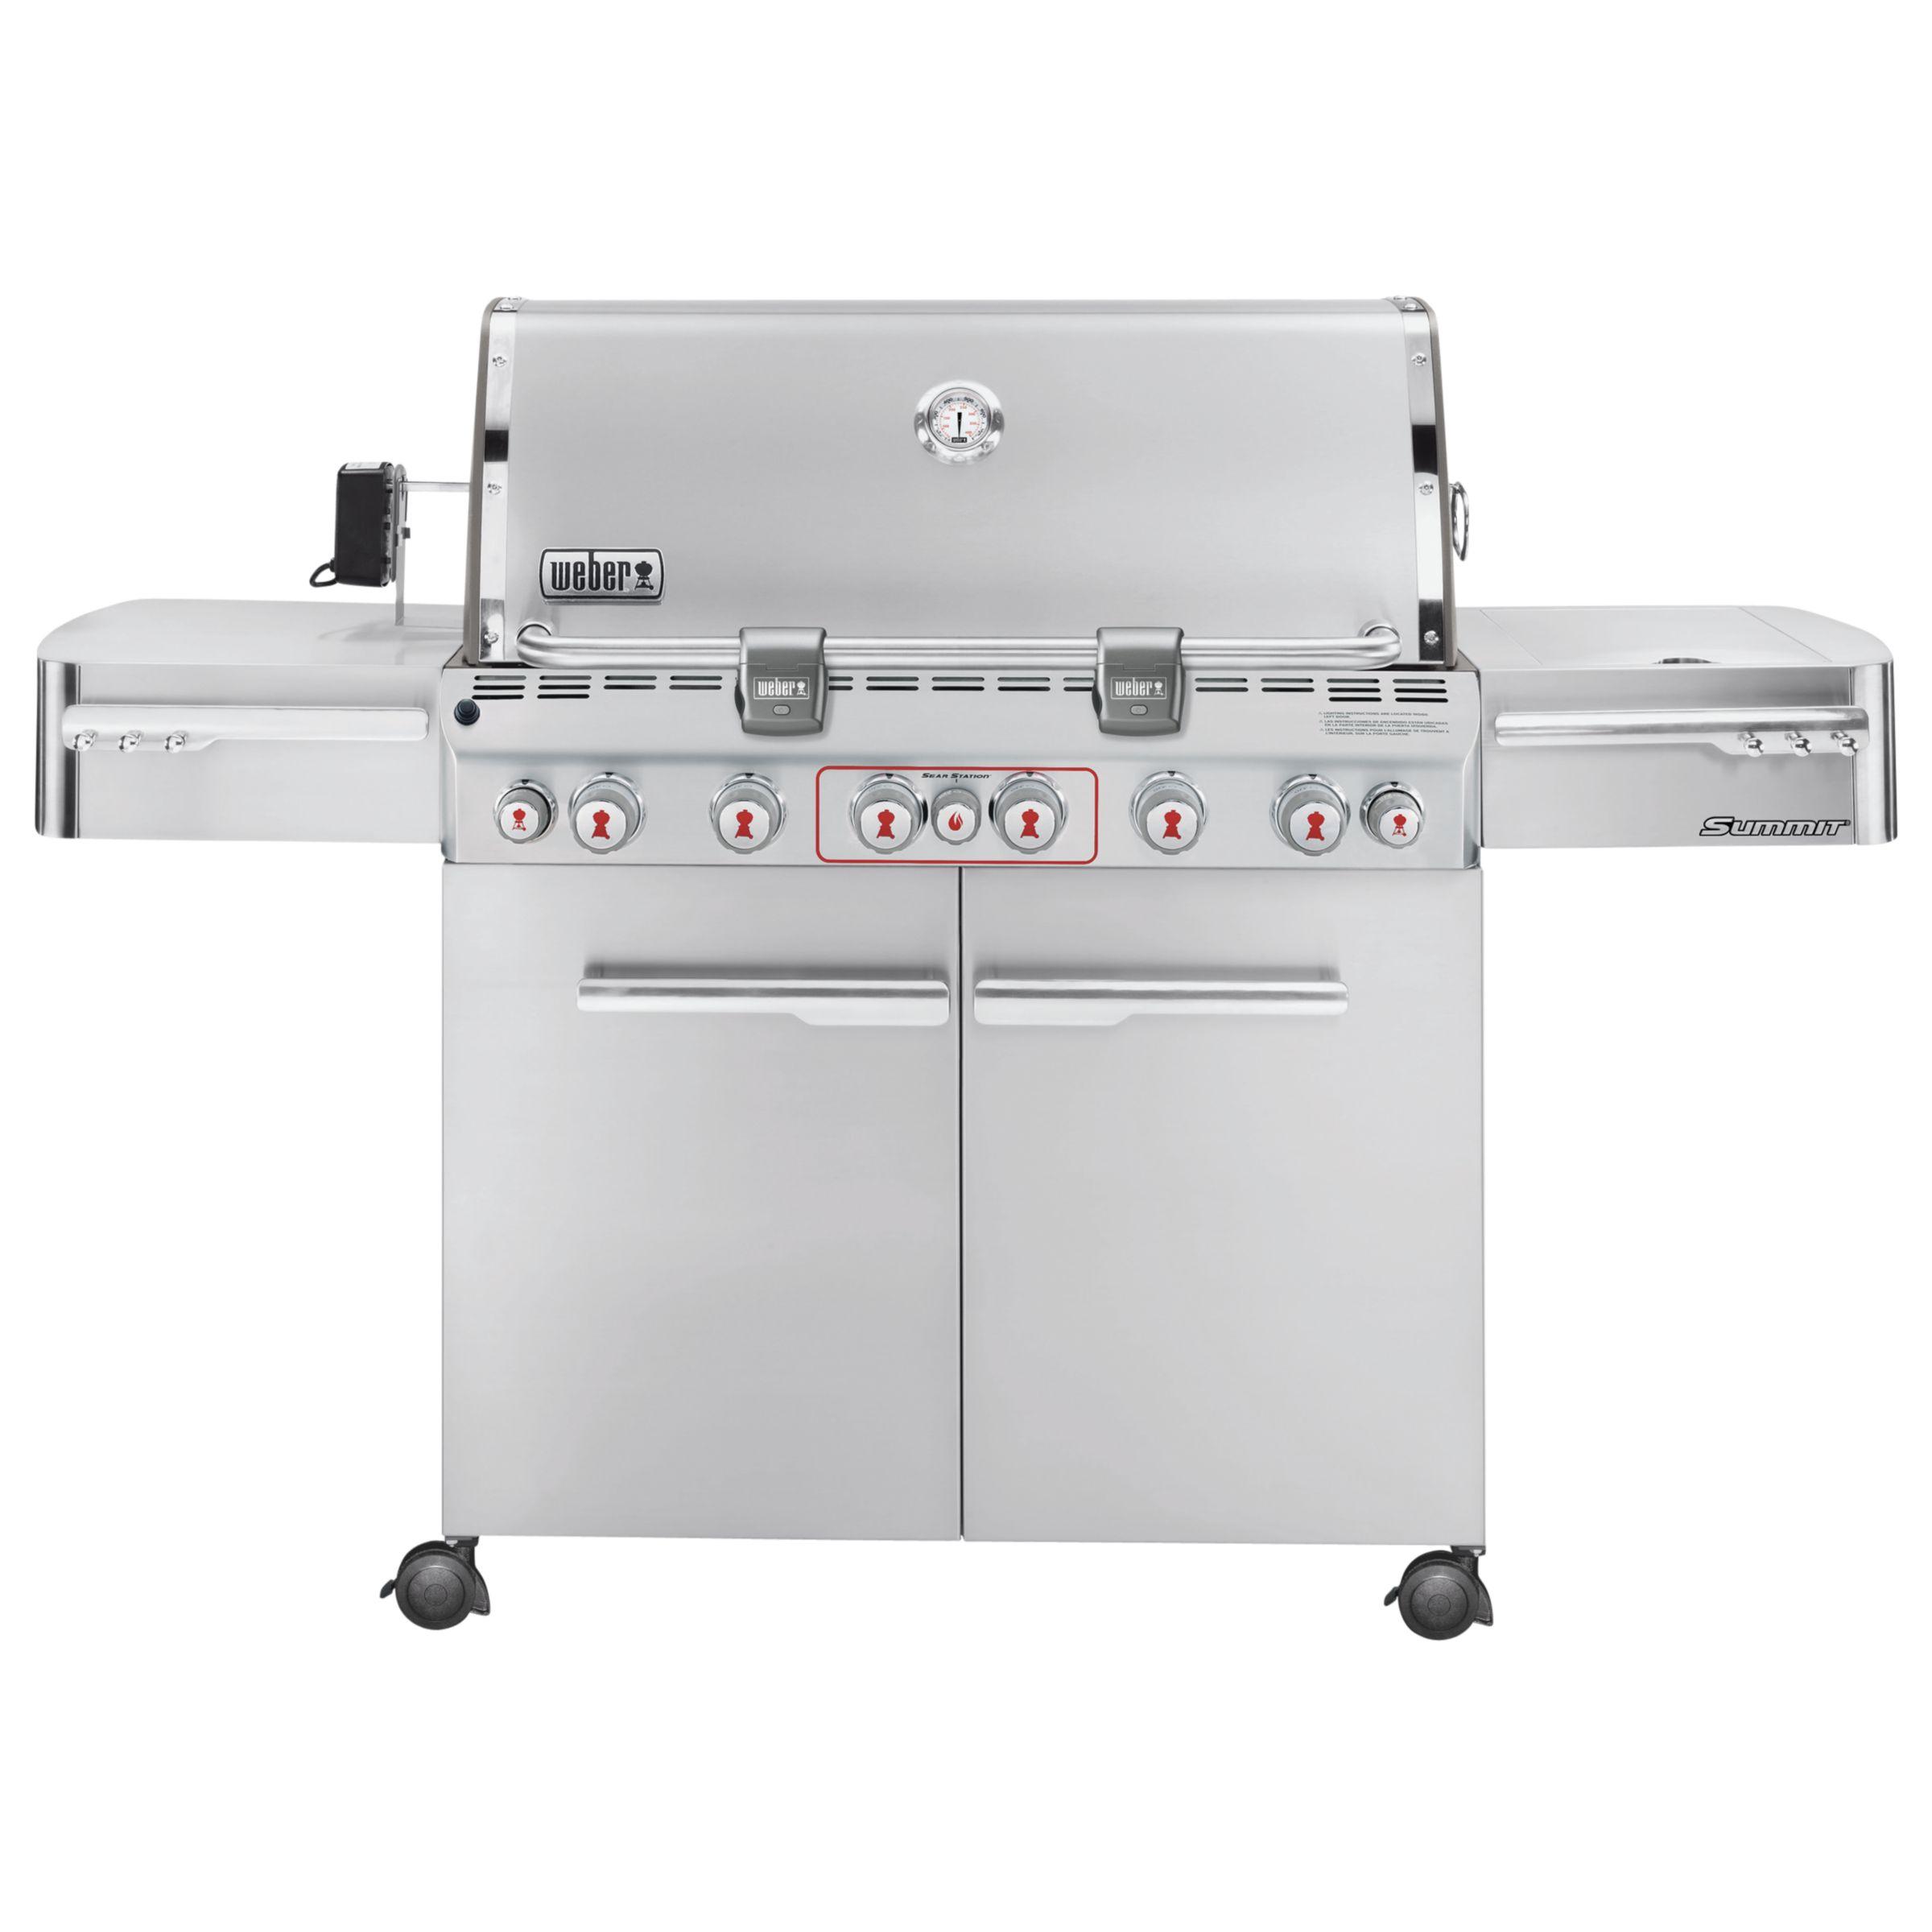 Weber S670 Gas Barbecue